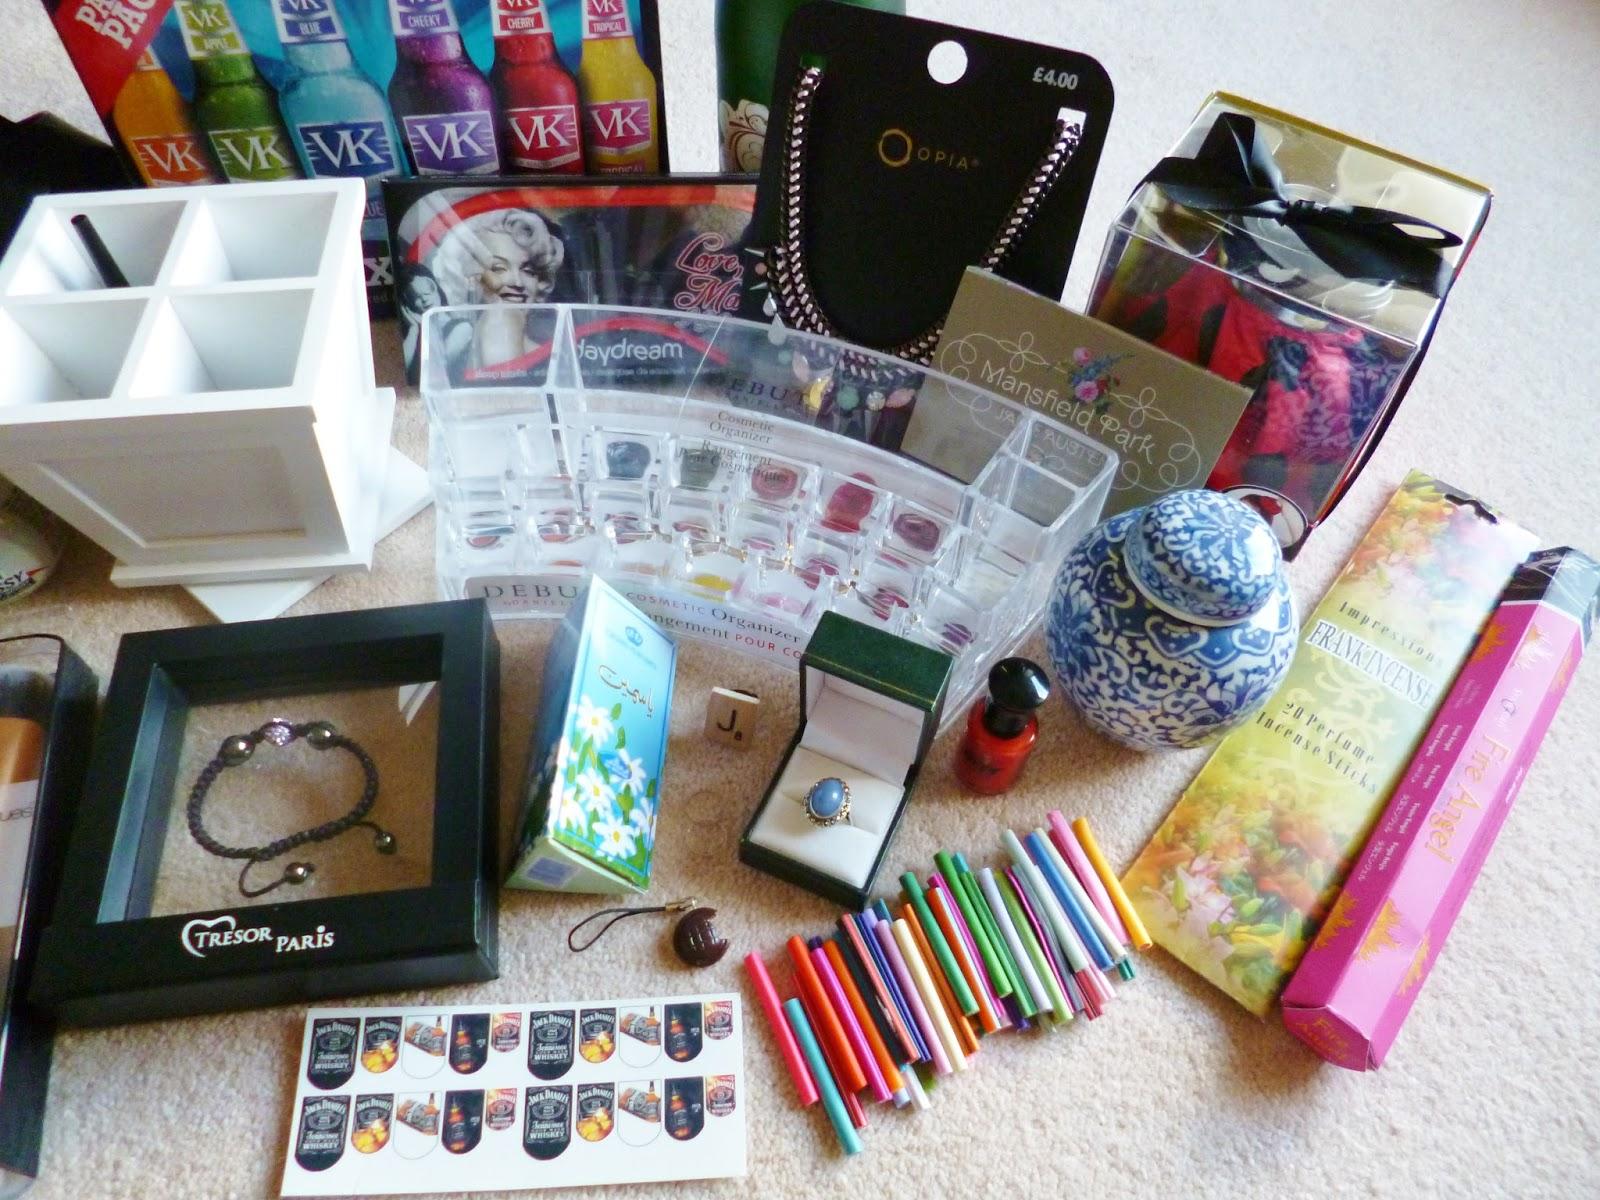 Good Gift Ideas For Boyfriends 21st Birthday Inspirations of